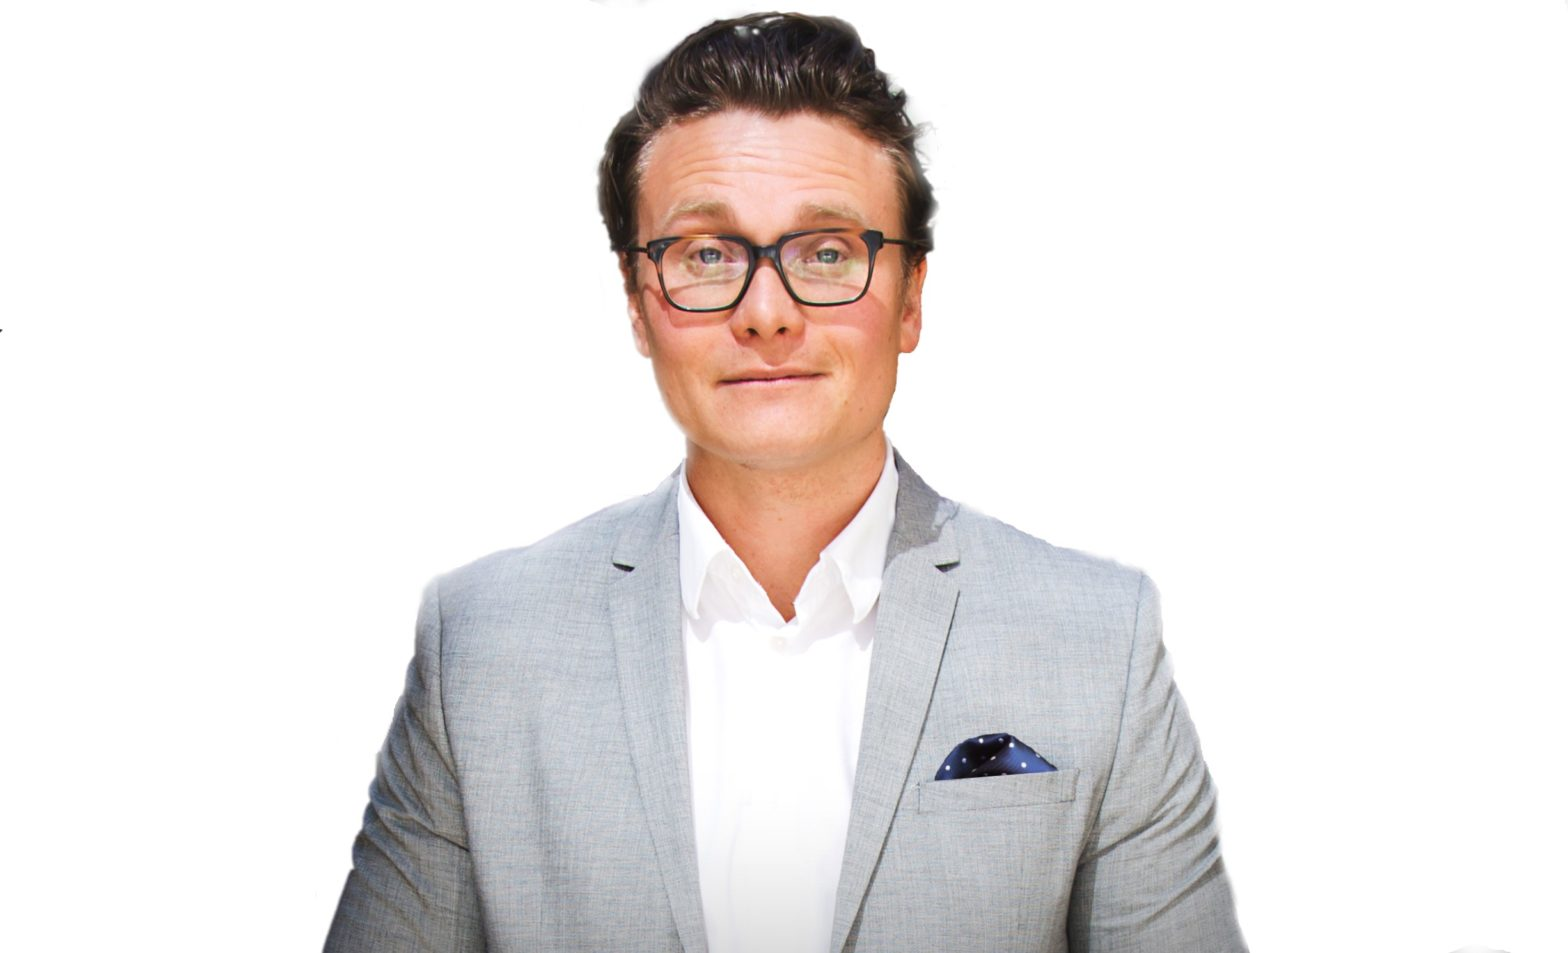 Fredrik Grufvisare, CEO, UBI Global